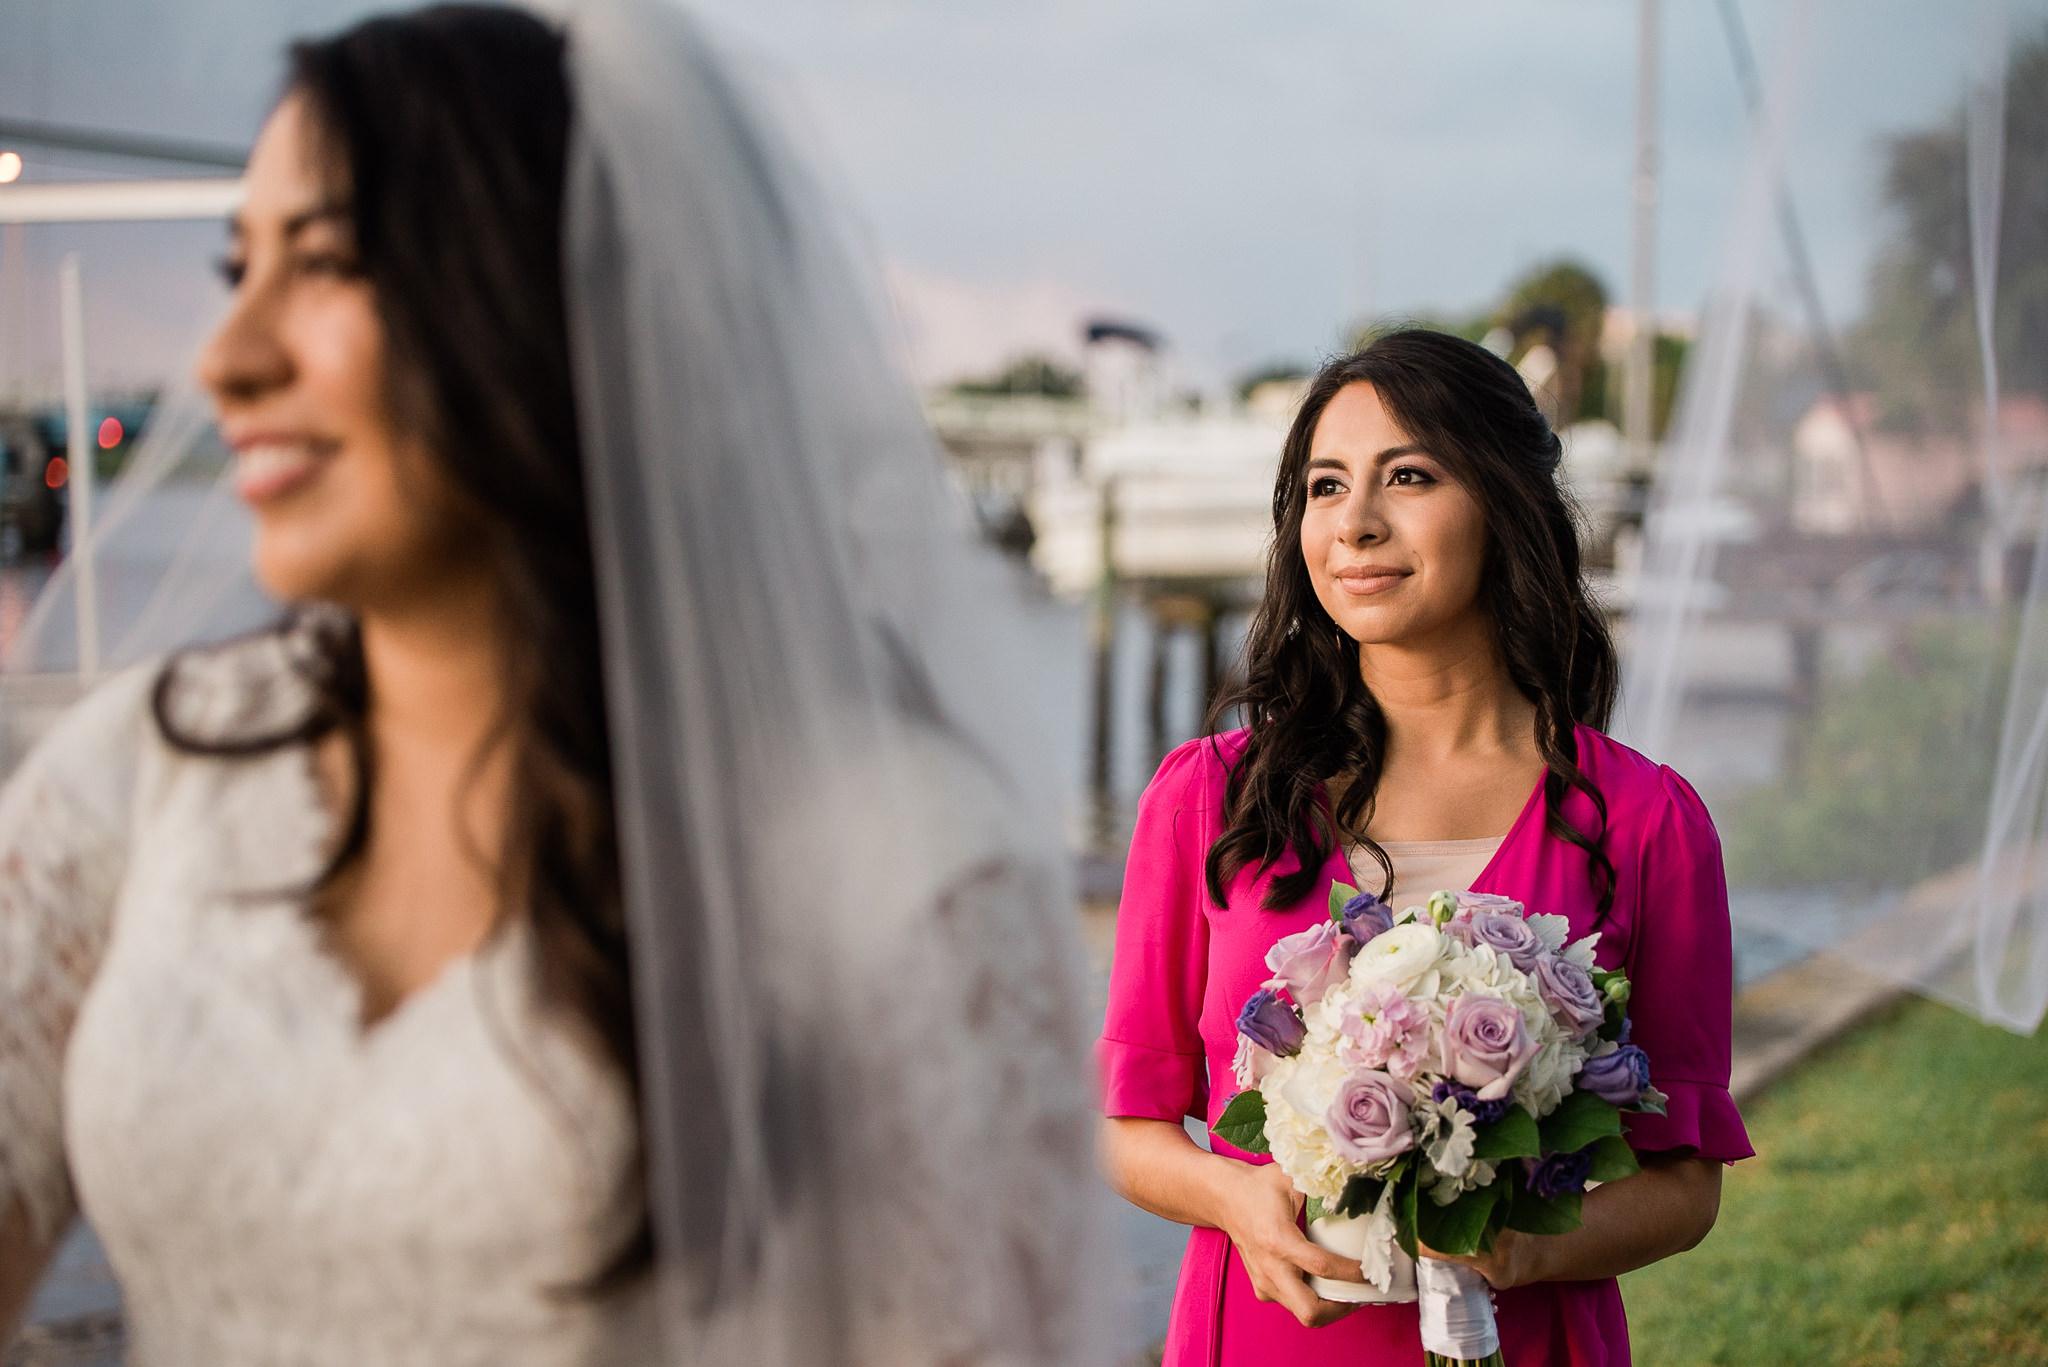 TAMPA_WEDDING_PHOTOGRAPHER_AAMZ_7117.jpg